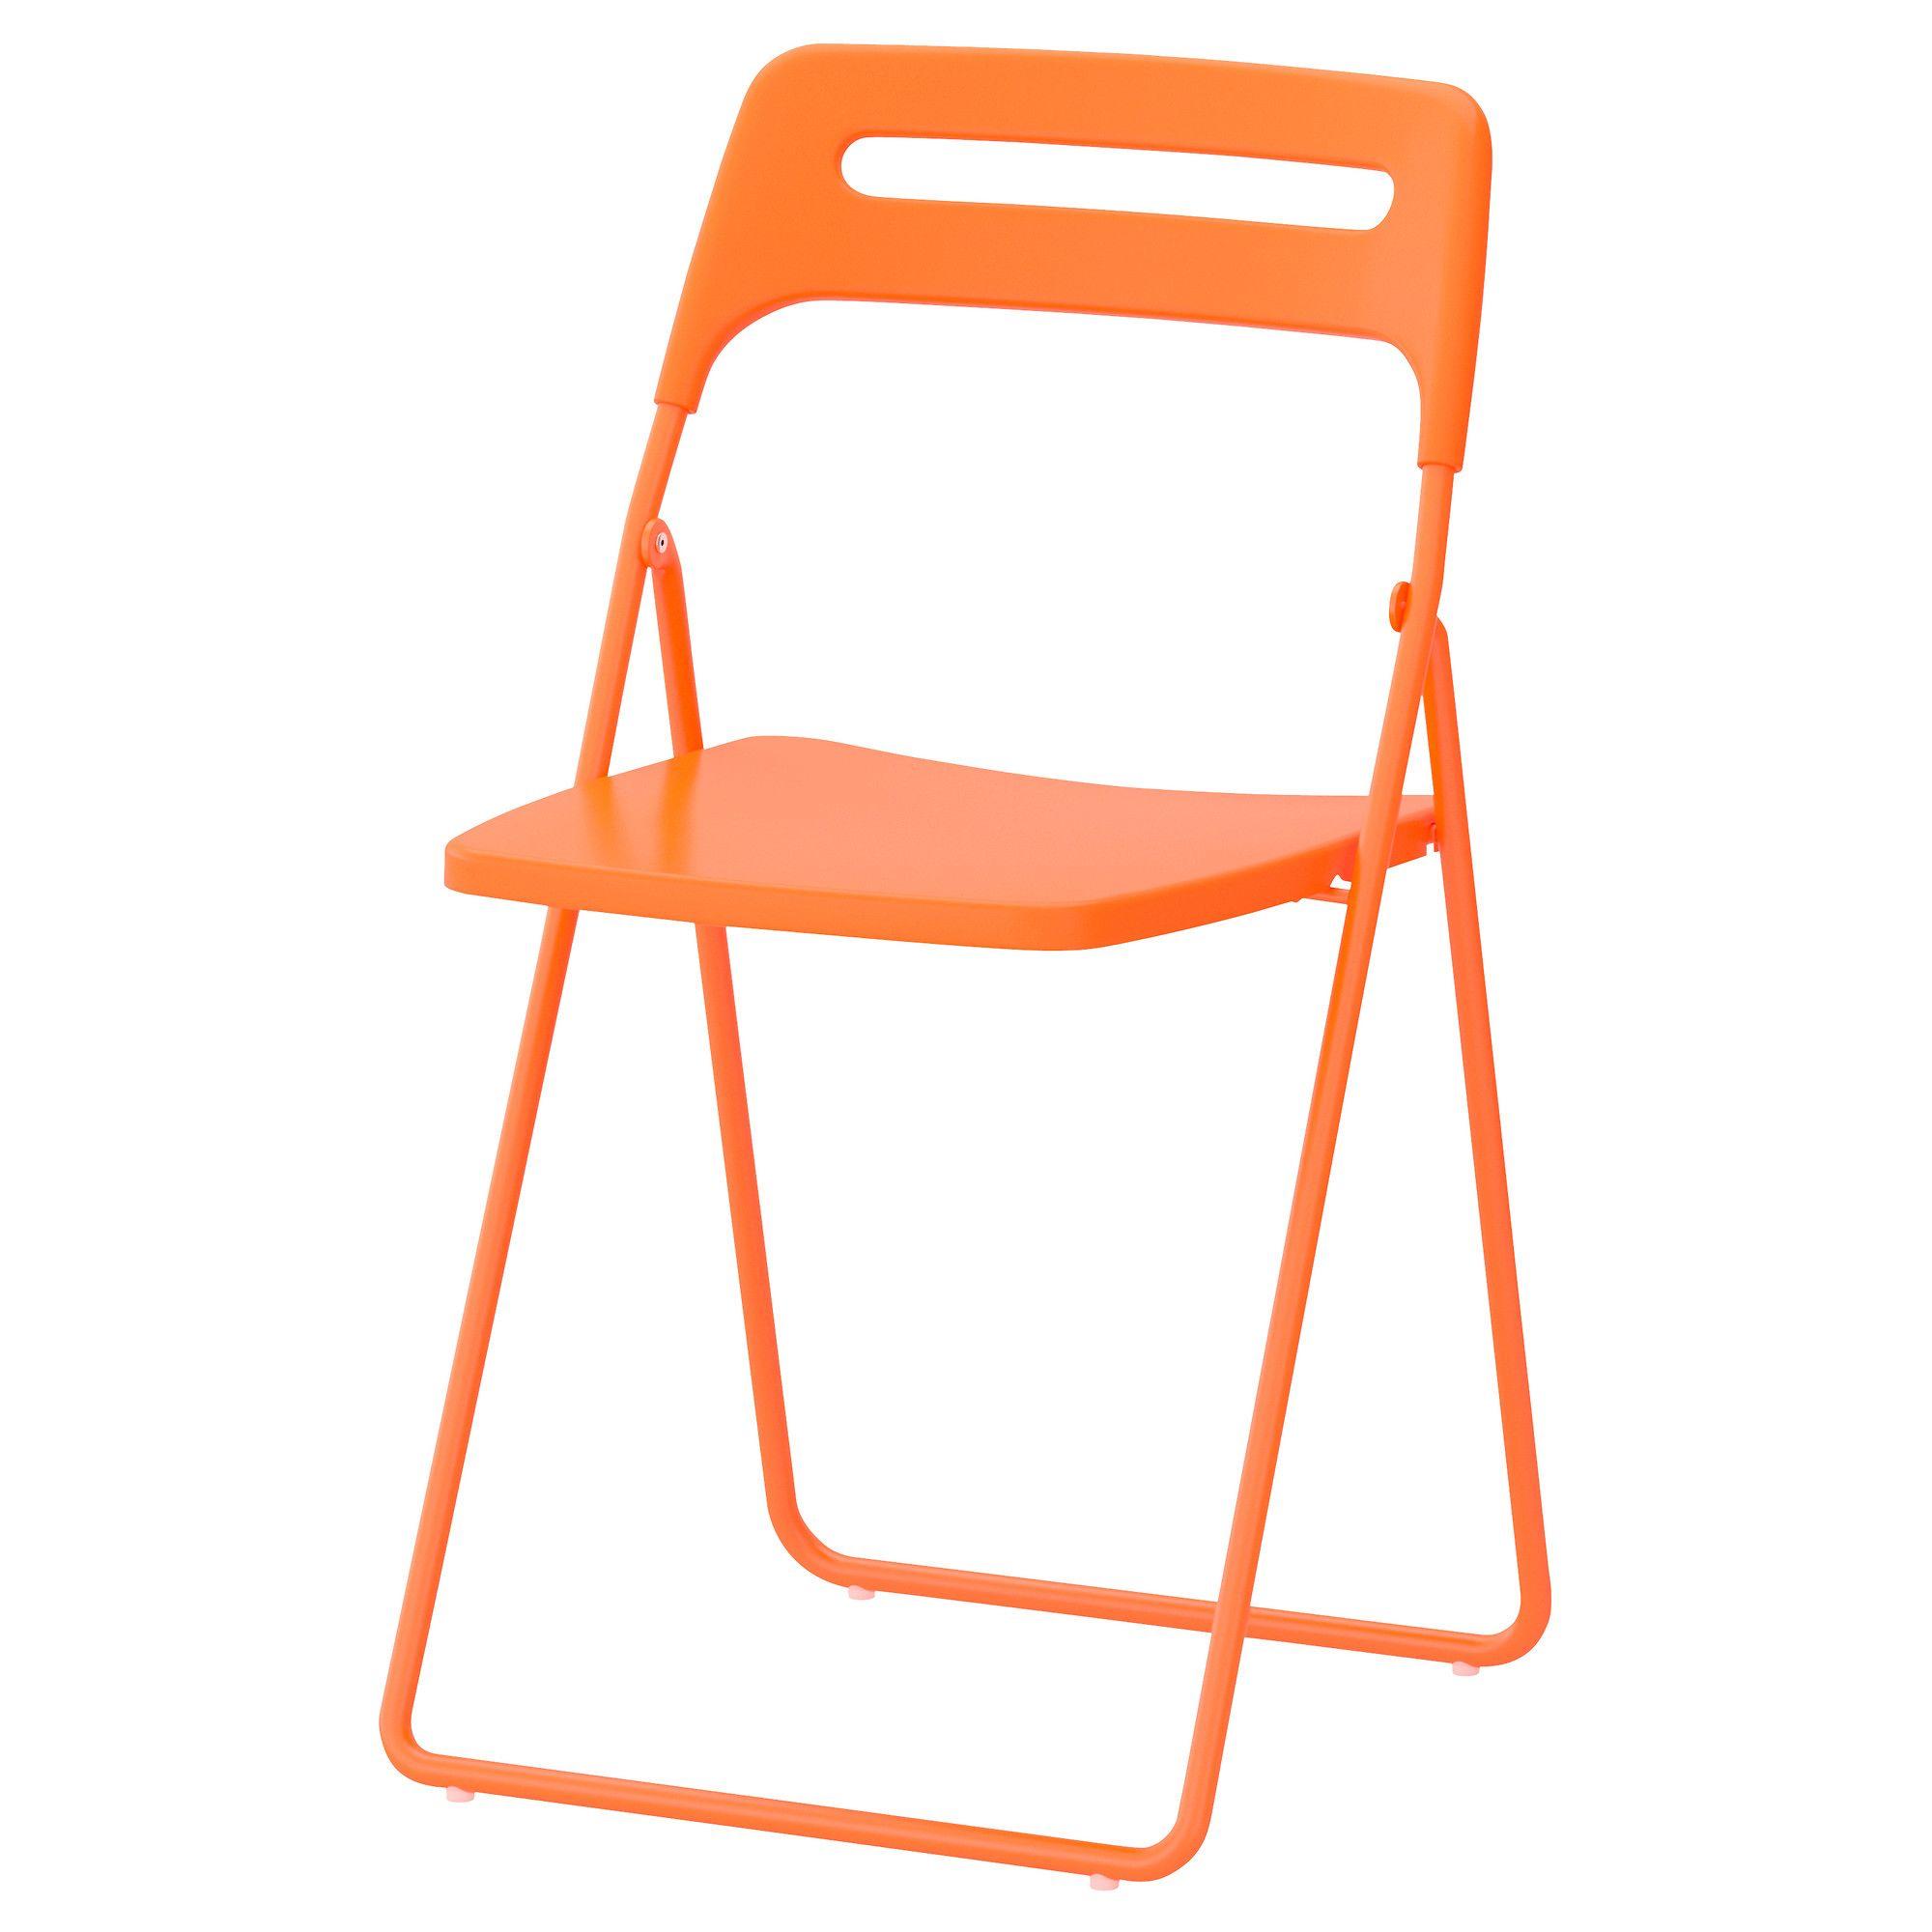 Ikea Us Furniture And Home Furnishings Ikea Dining Chair Ikea Folding Chairs Folding Chair